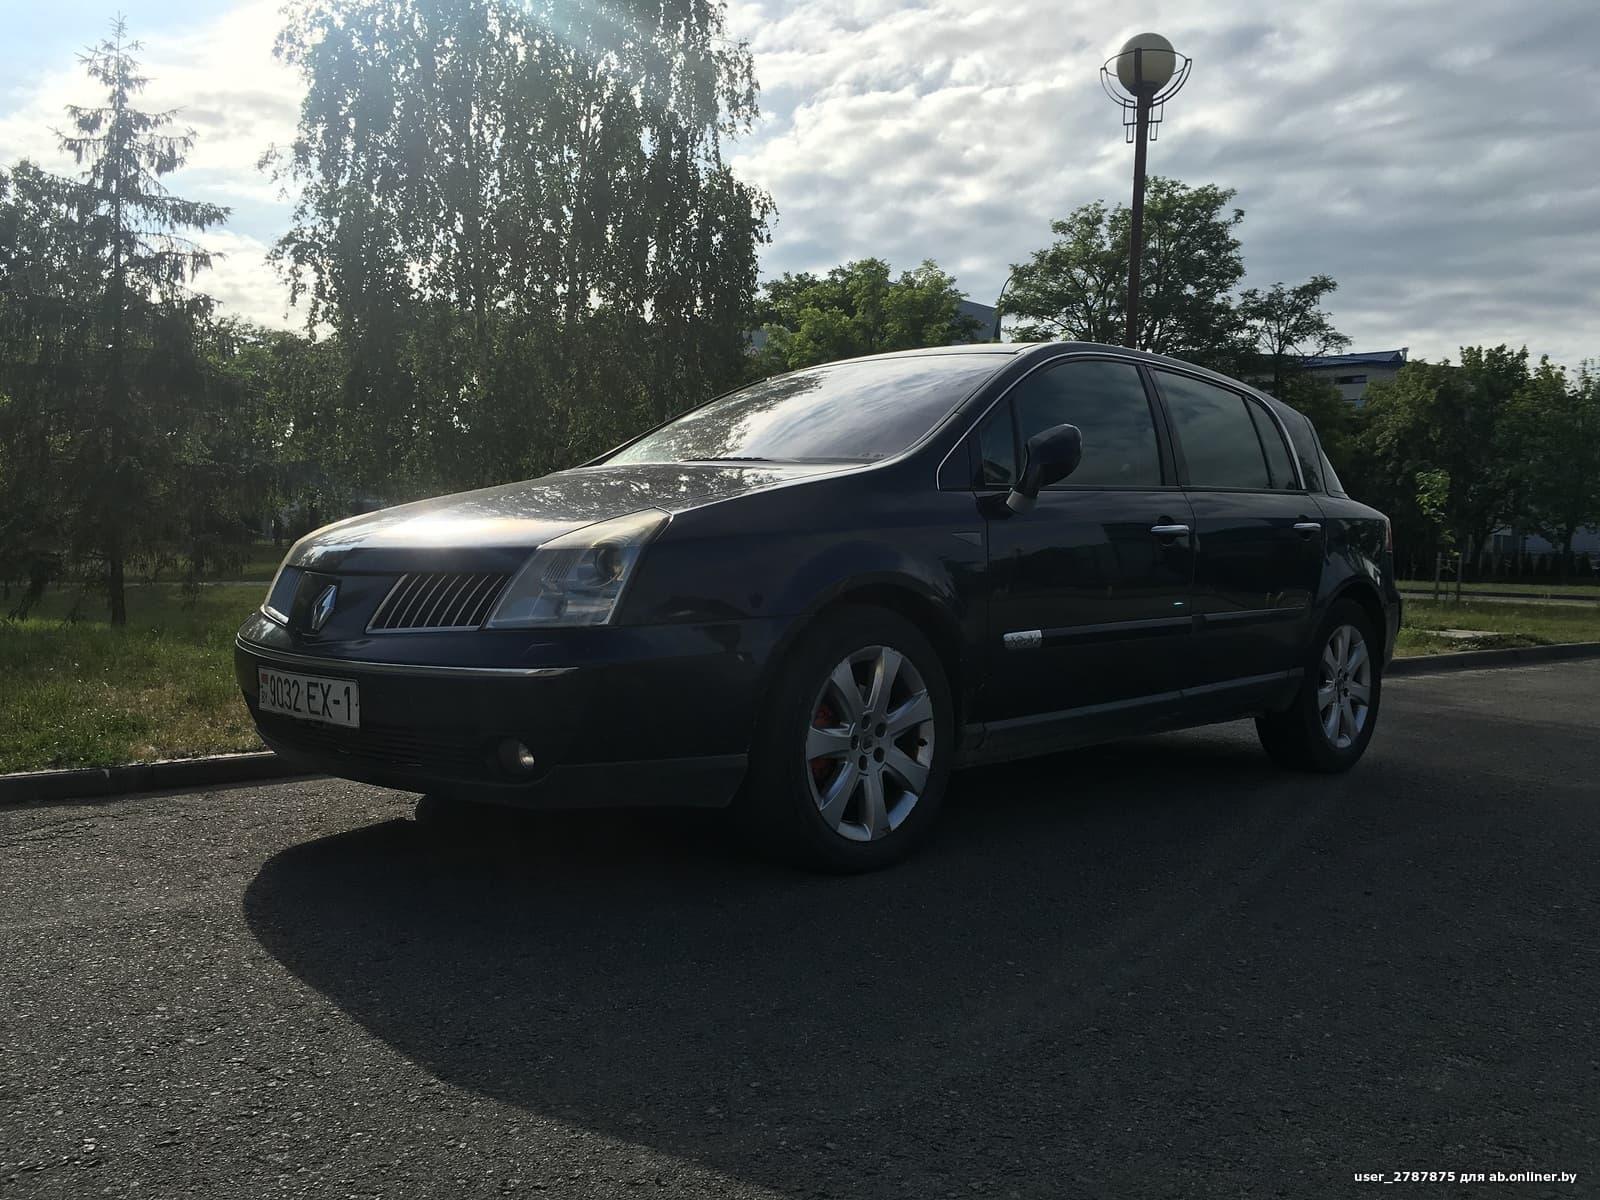 Renault Vel Satis Initiale